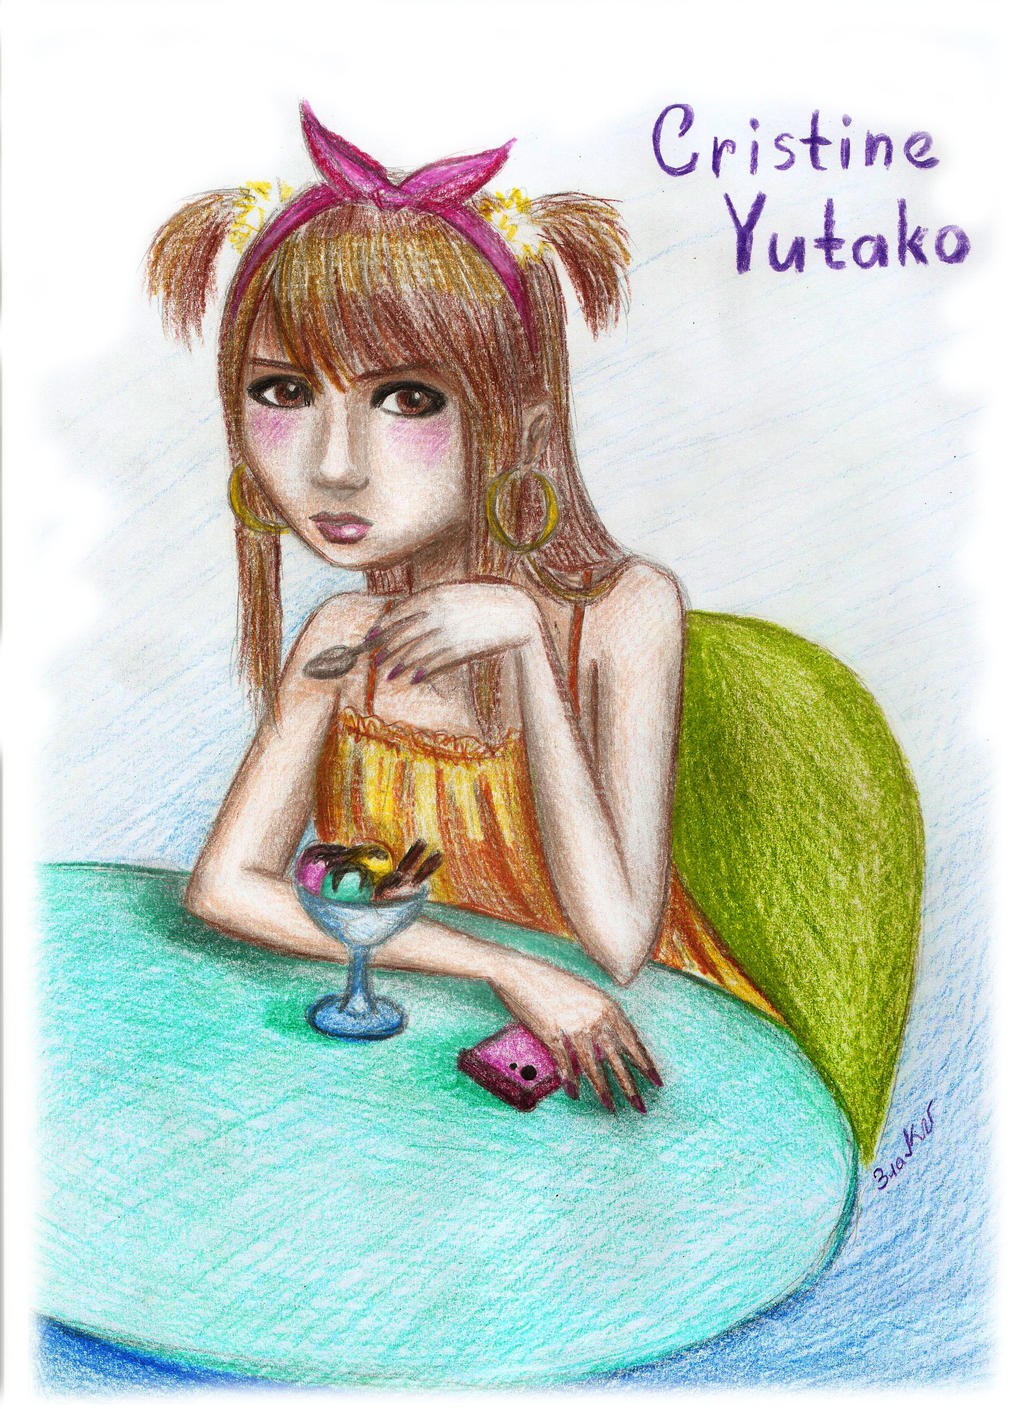 Cristine Yutako by GoldenYume